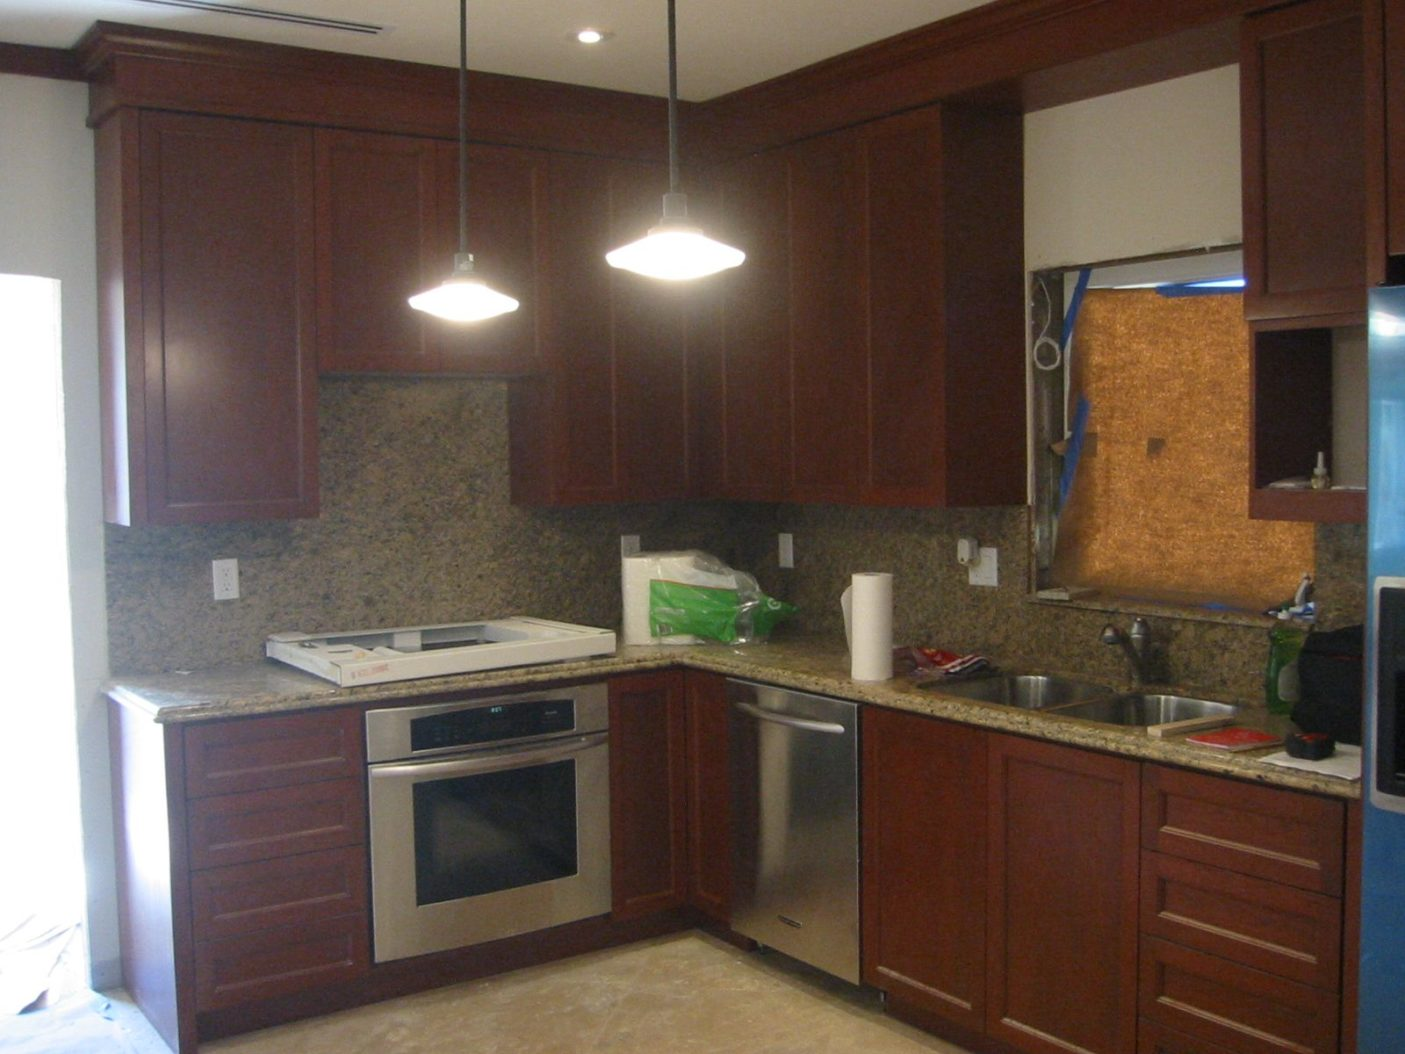 Kitchens-111.jpg